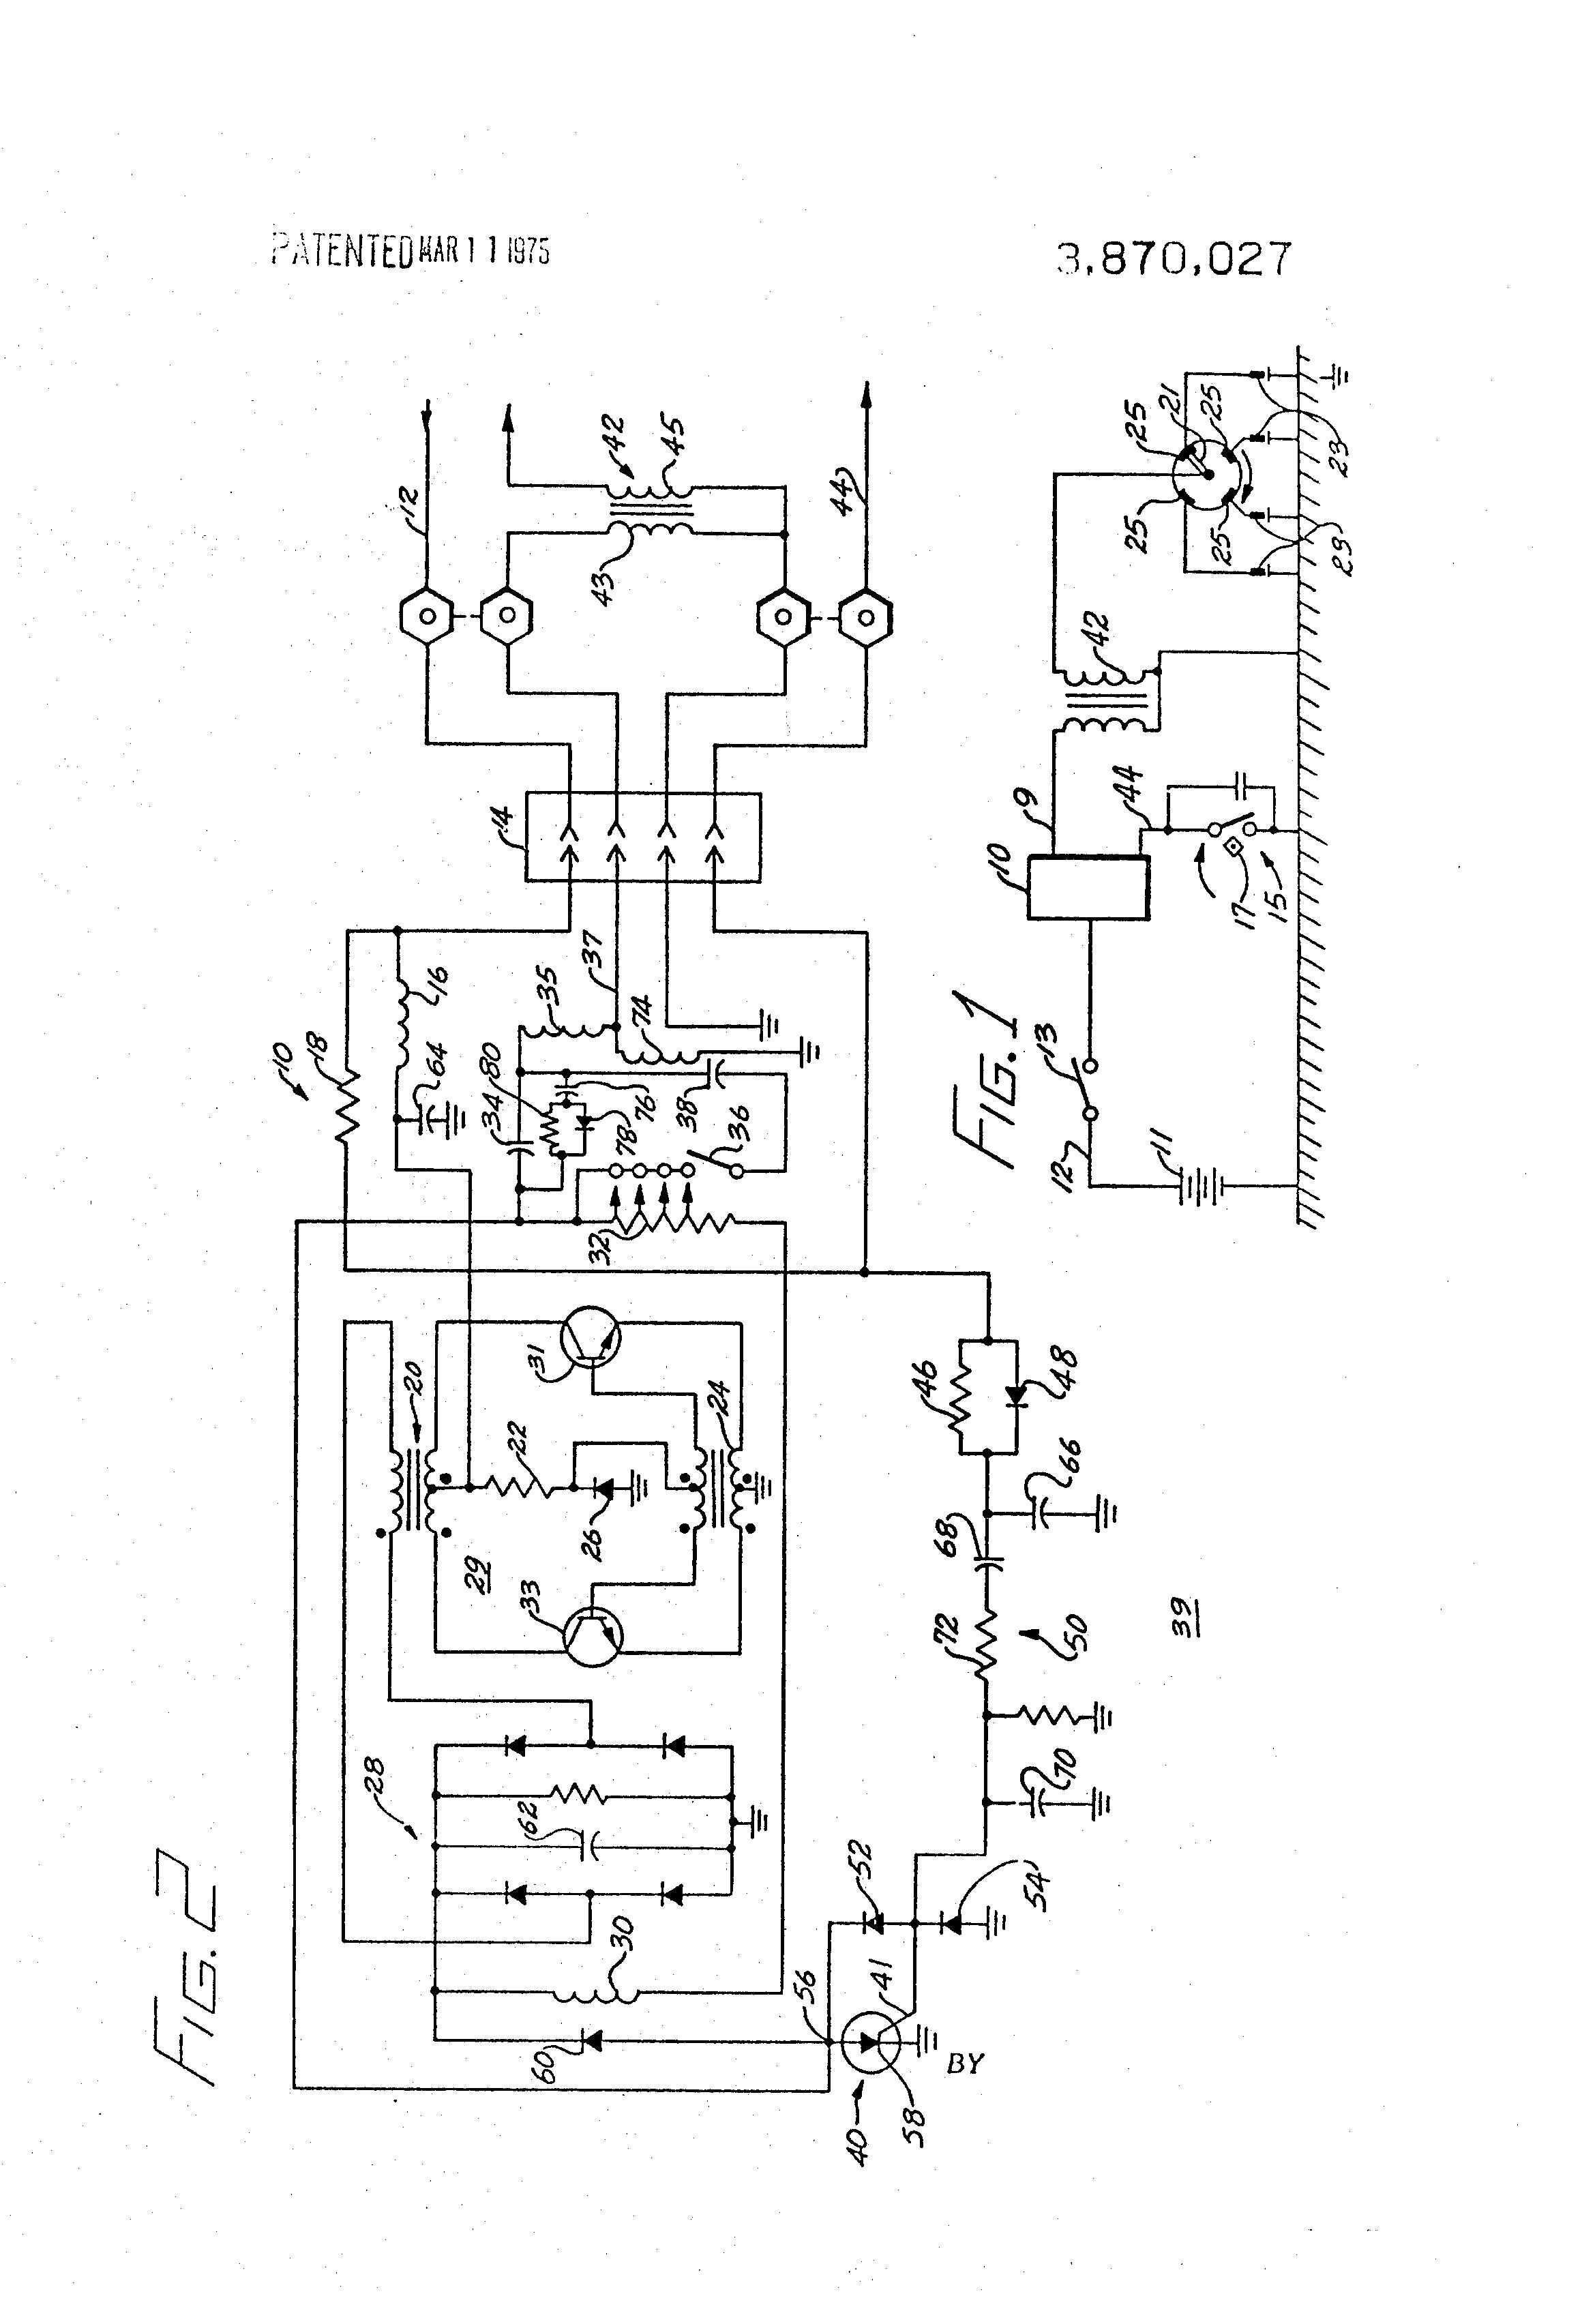 براءة الاختراع US3870027 - Capacitive discharge ignition